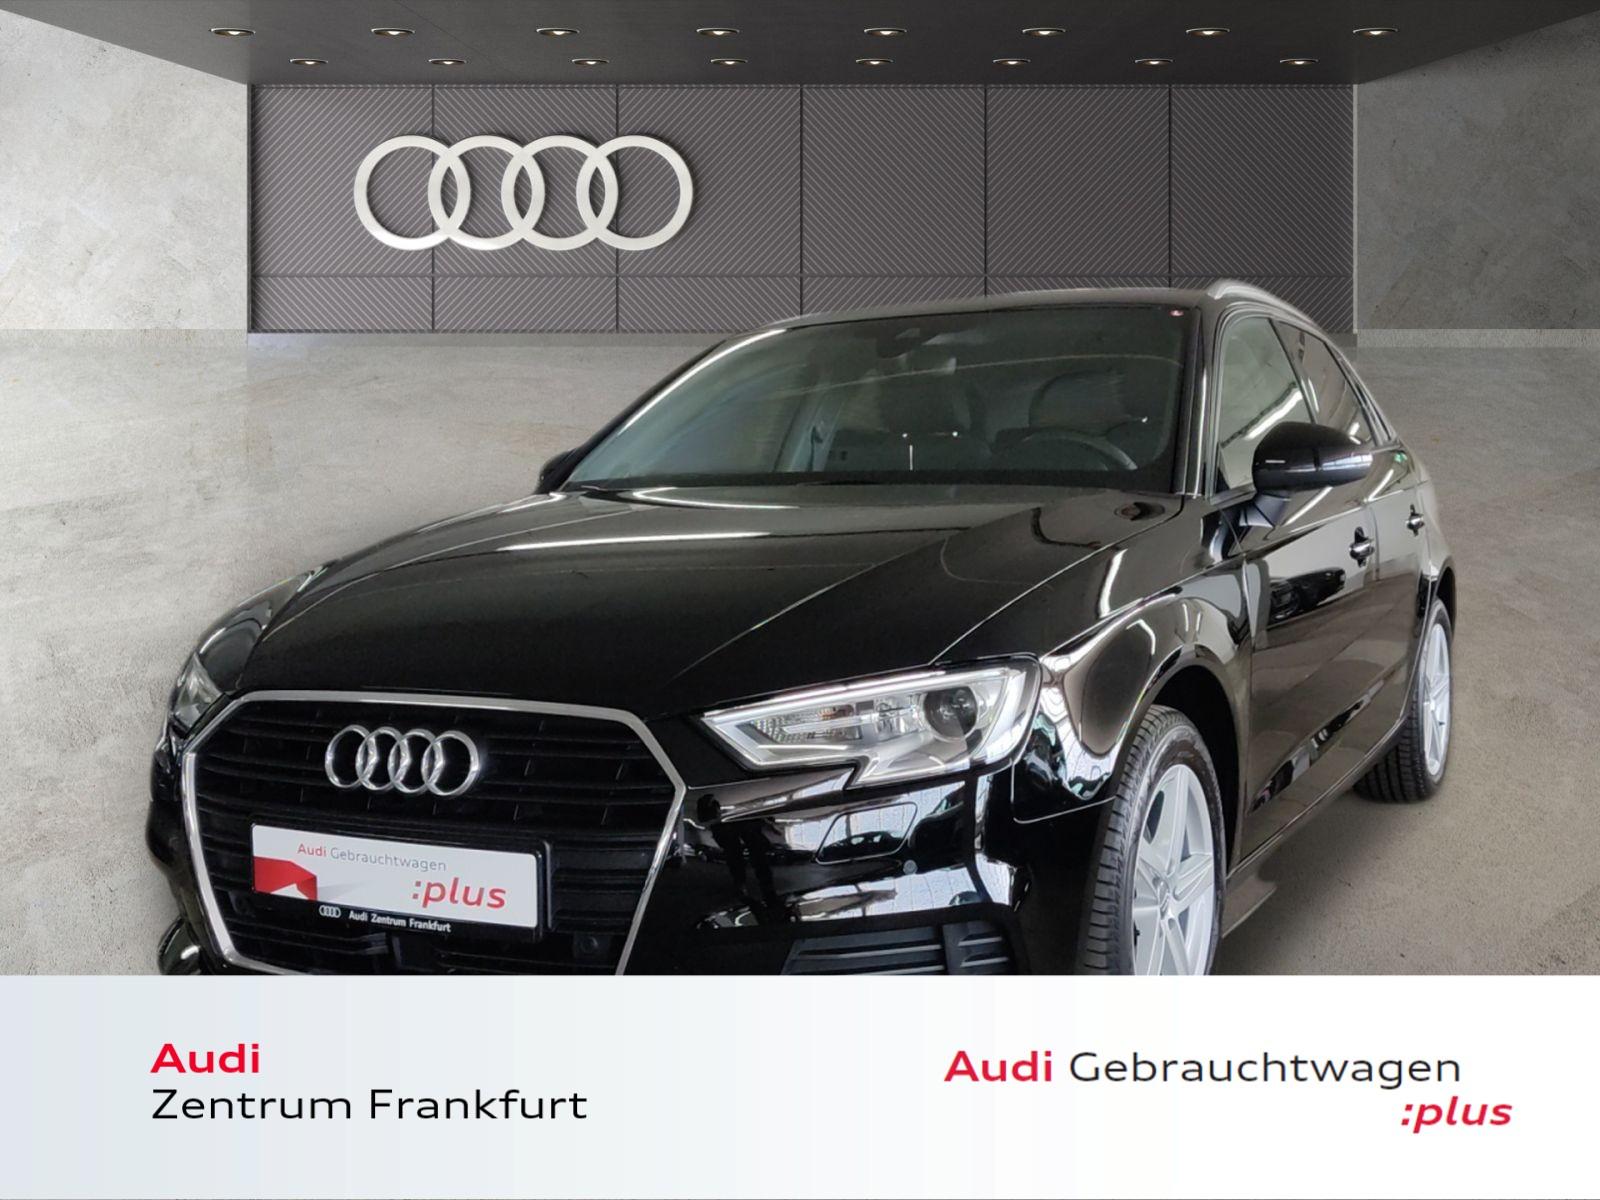 Audi A3 Sportback 30 TFSI Xenon Navi PDC Bluetooth, Jahr 2019, Benzin